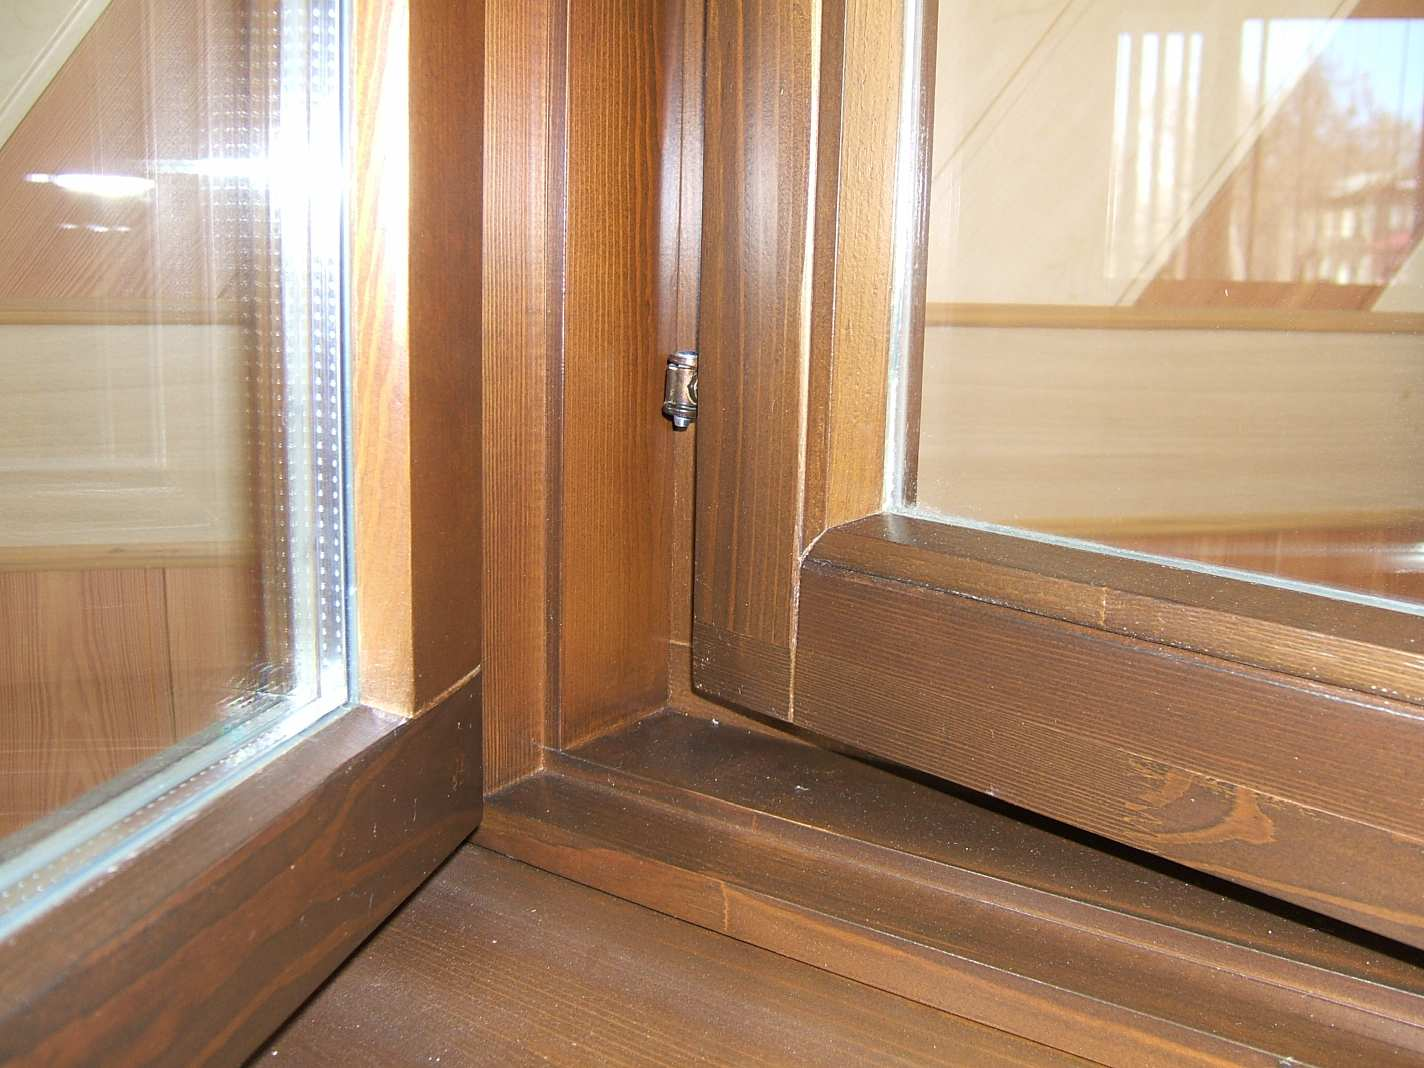 Финские деревянные окна со стеклопакетами – тепло и уют